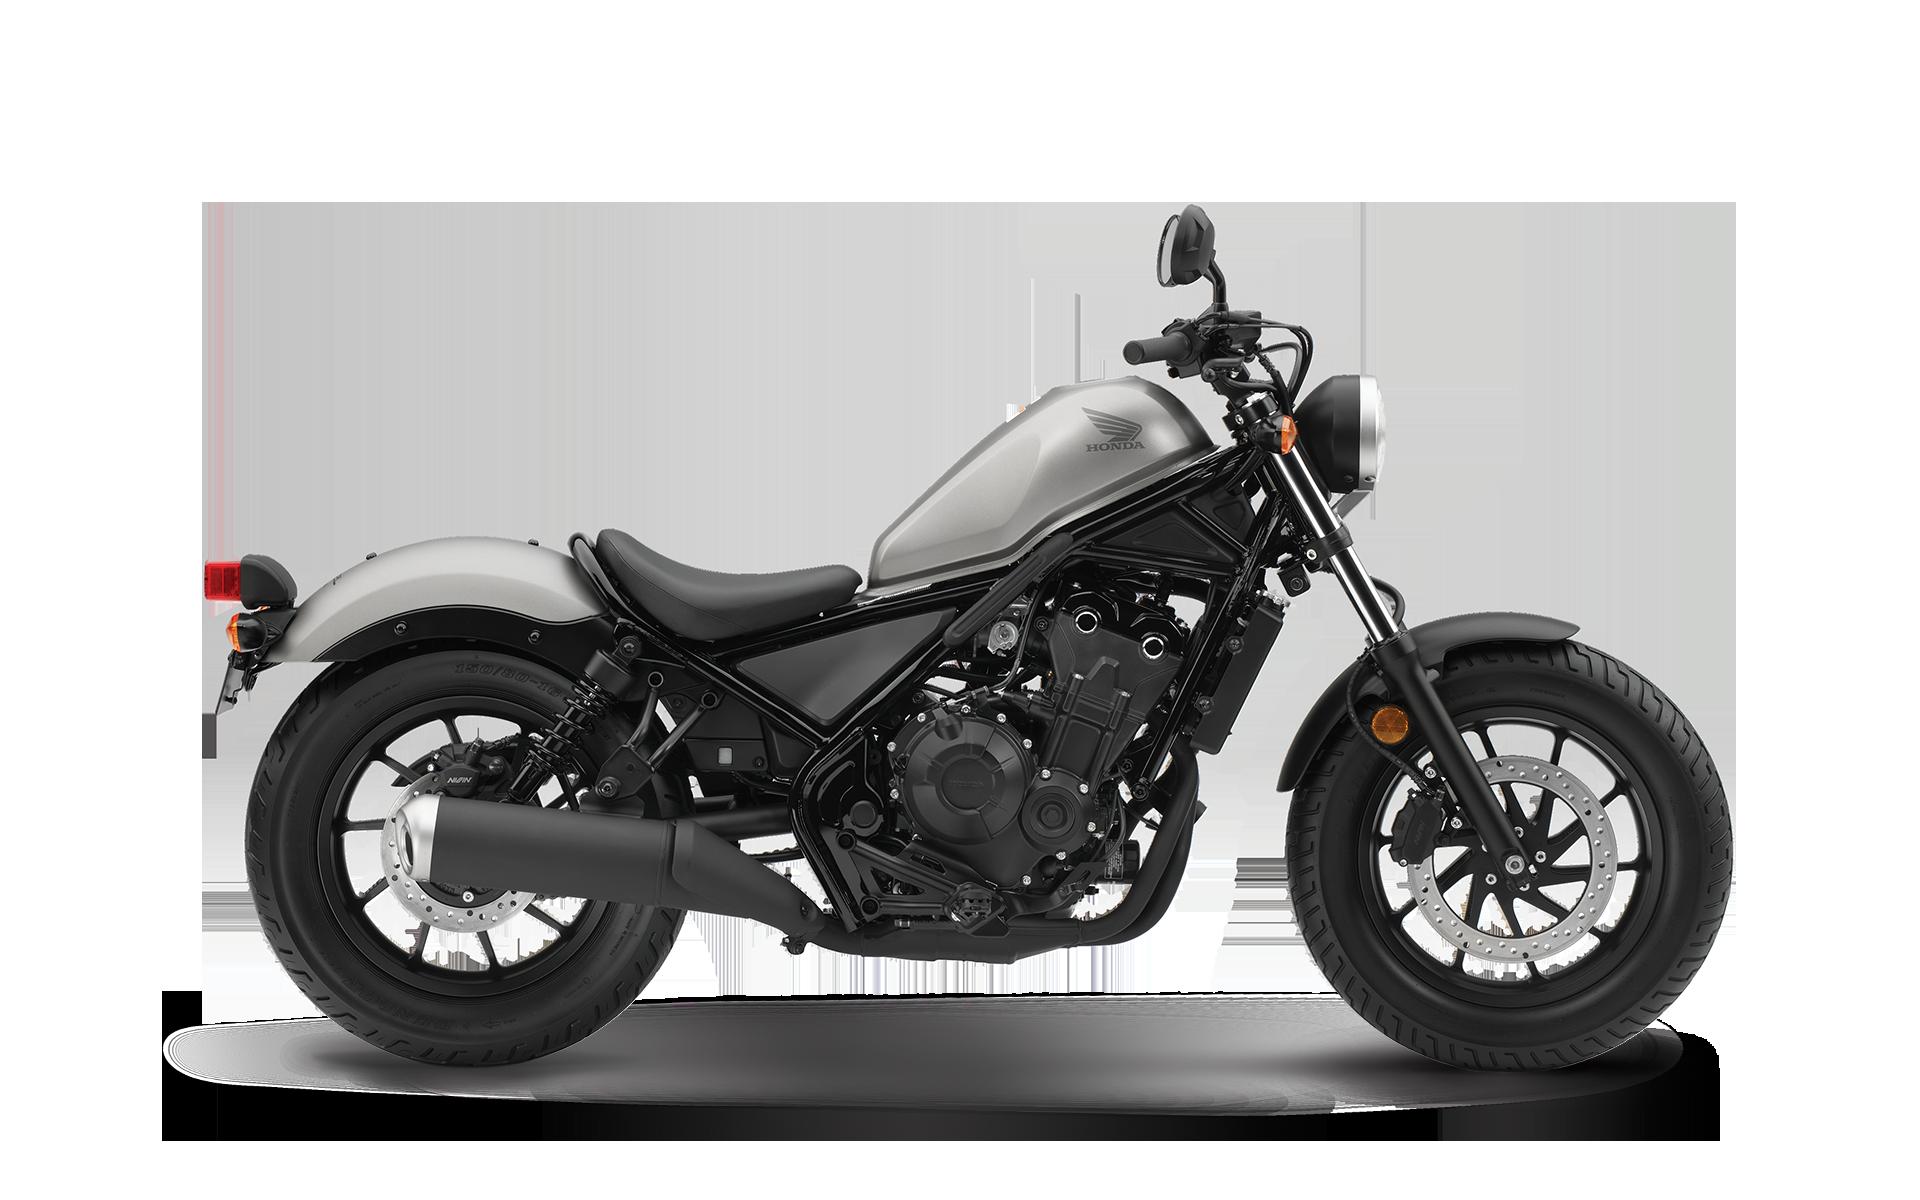 2017 honda fury for sale in victoria tx dale s fun center 866 359 5986 honda motorcycles pinterest honda fury honda and honda motorcycles